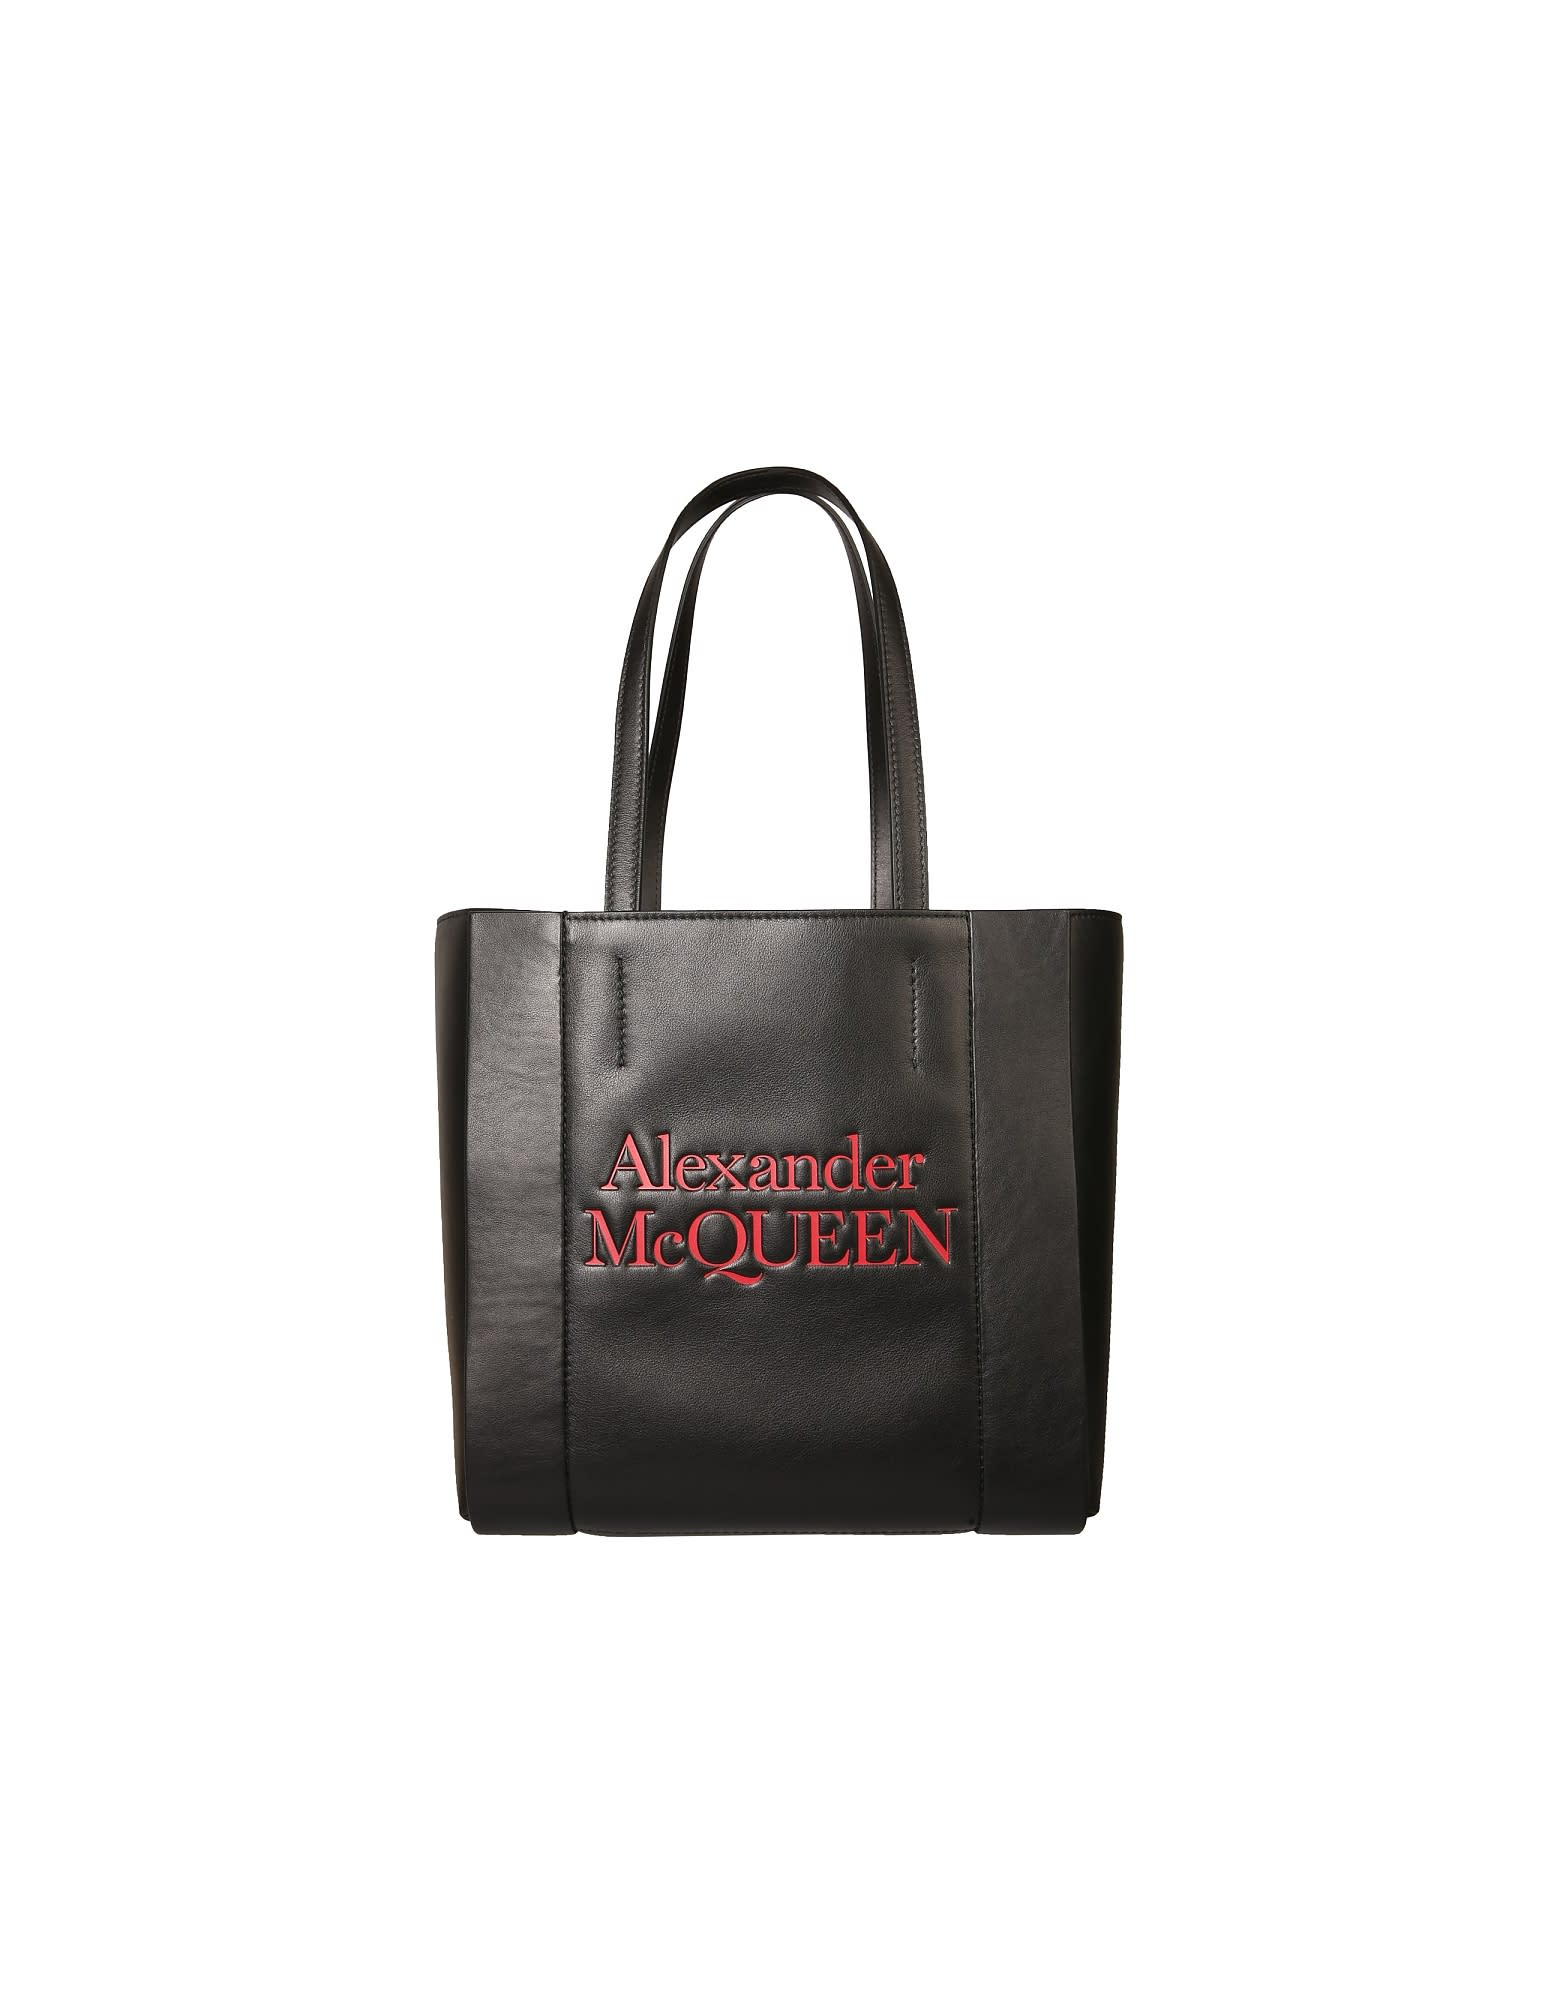 Alexander Mcqueen Canvases ALEXANDER MCQUEEN SIGNATURE TOTE BAG